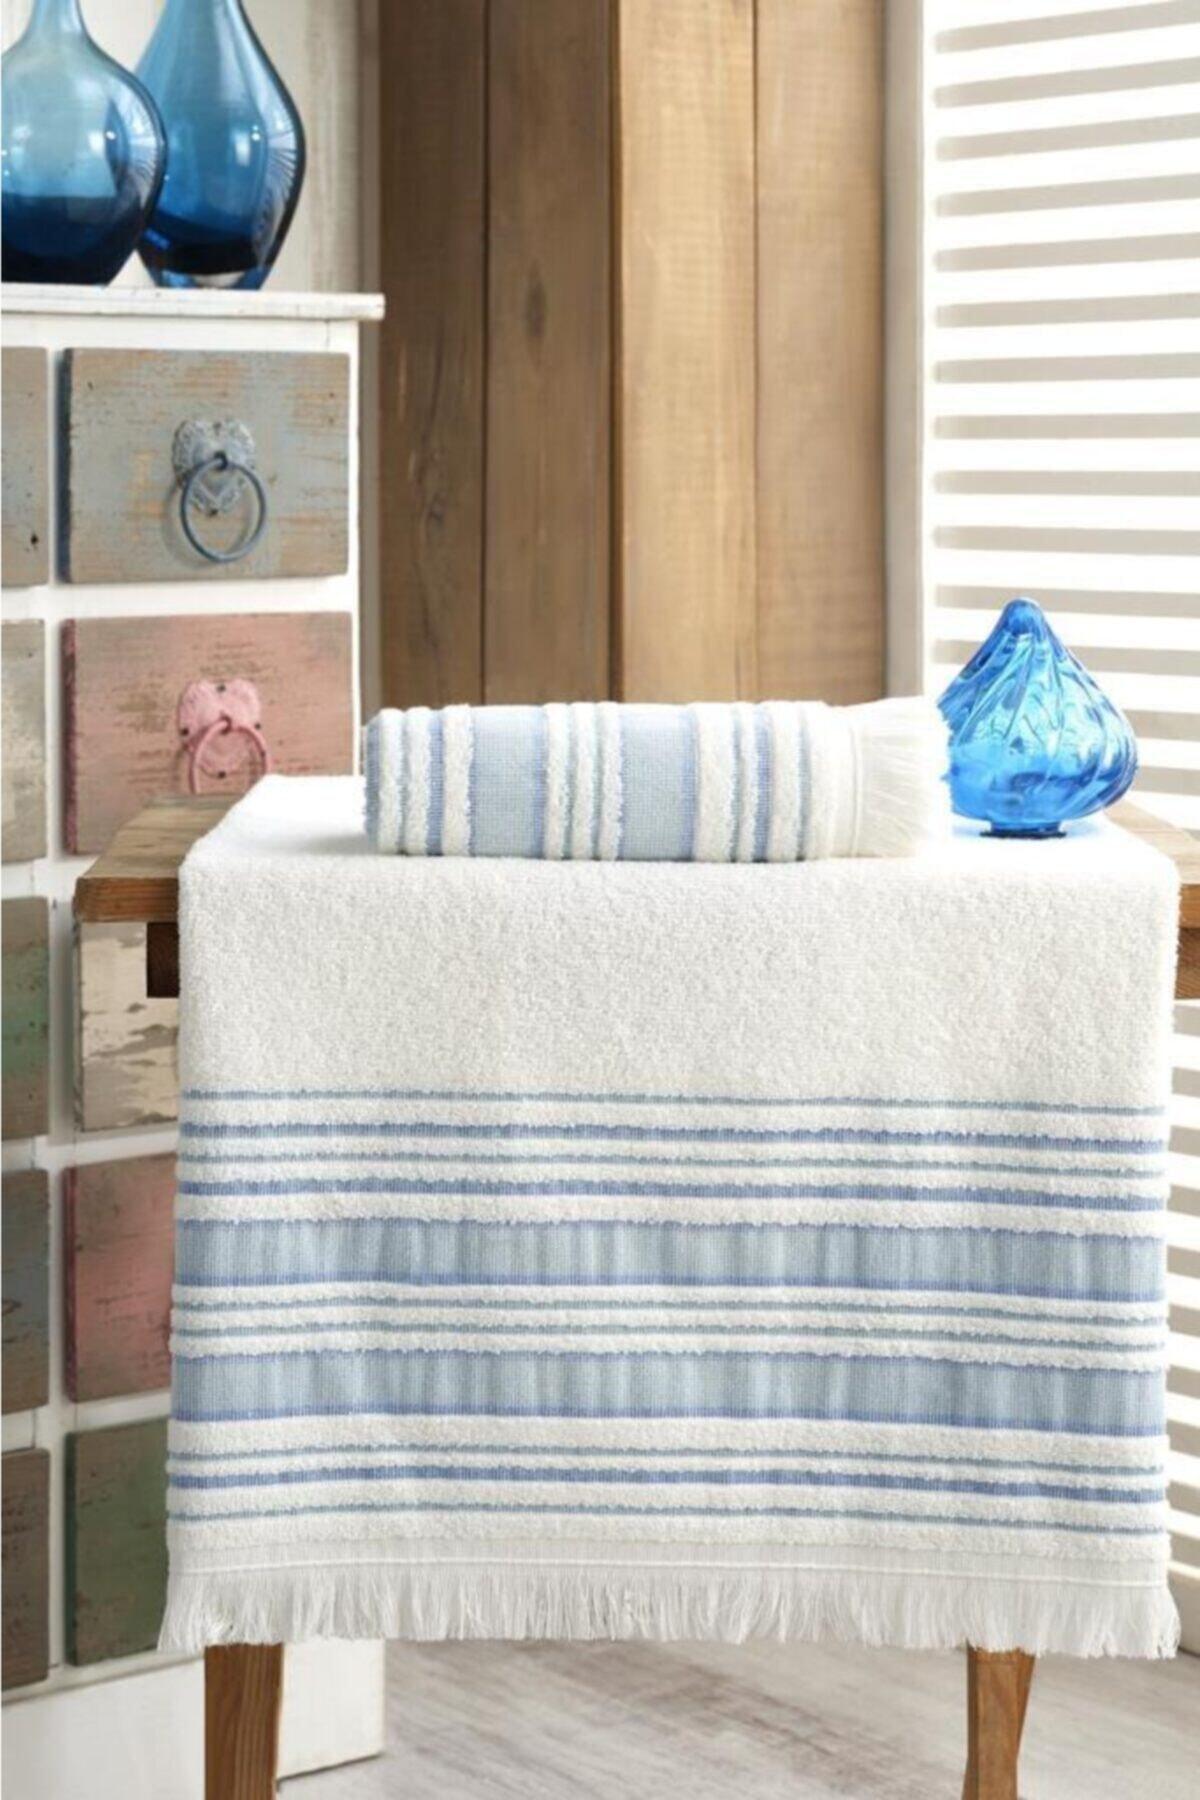 Louis Marie Mavi Banyo Havlu Takımı 70x140  50x90 1